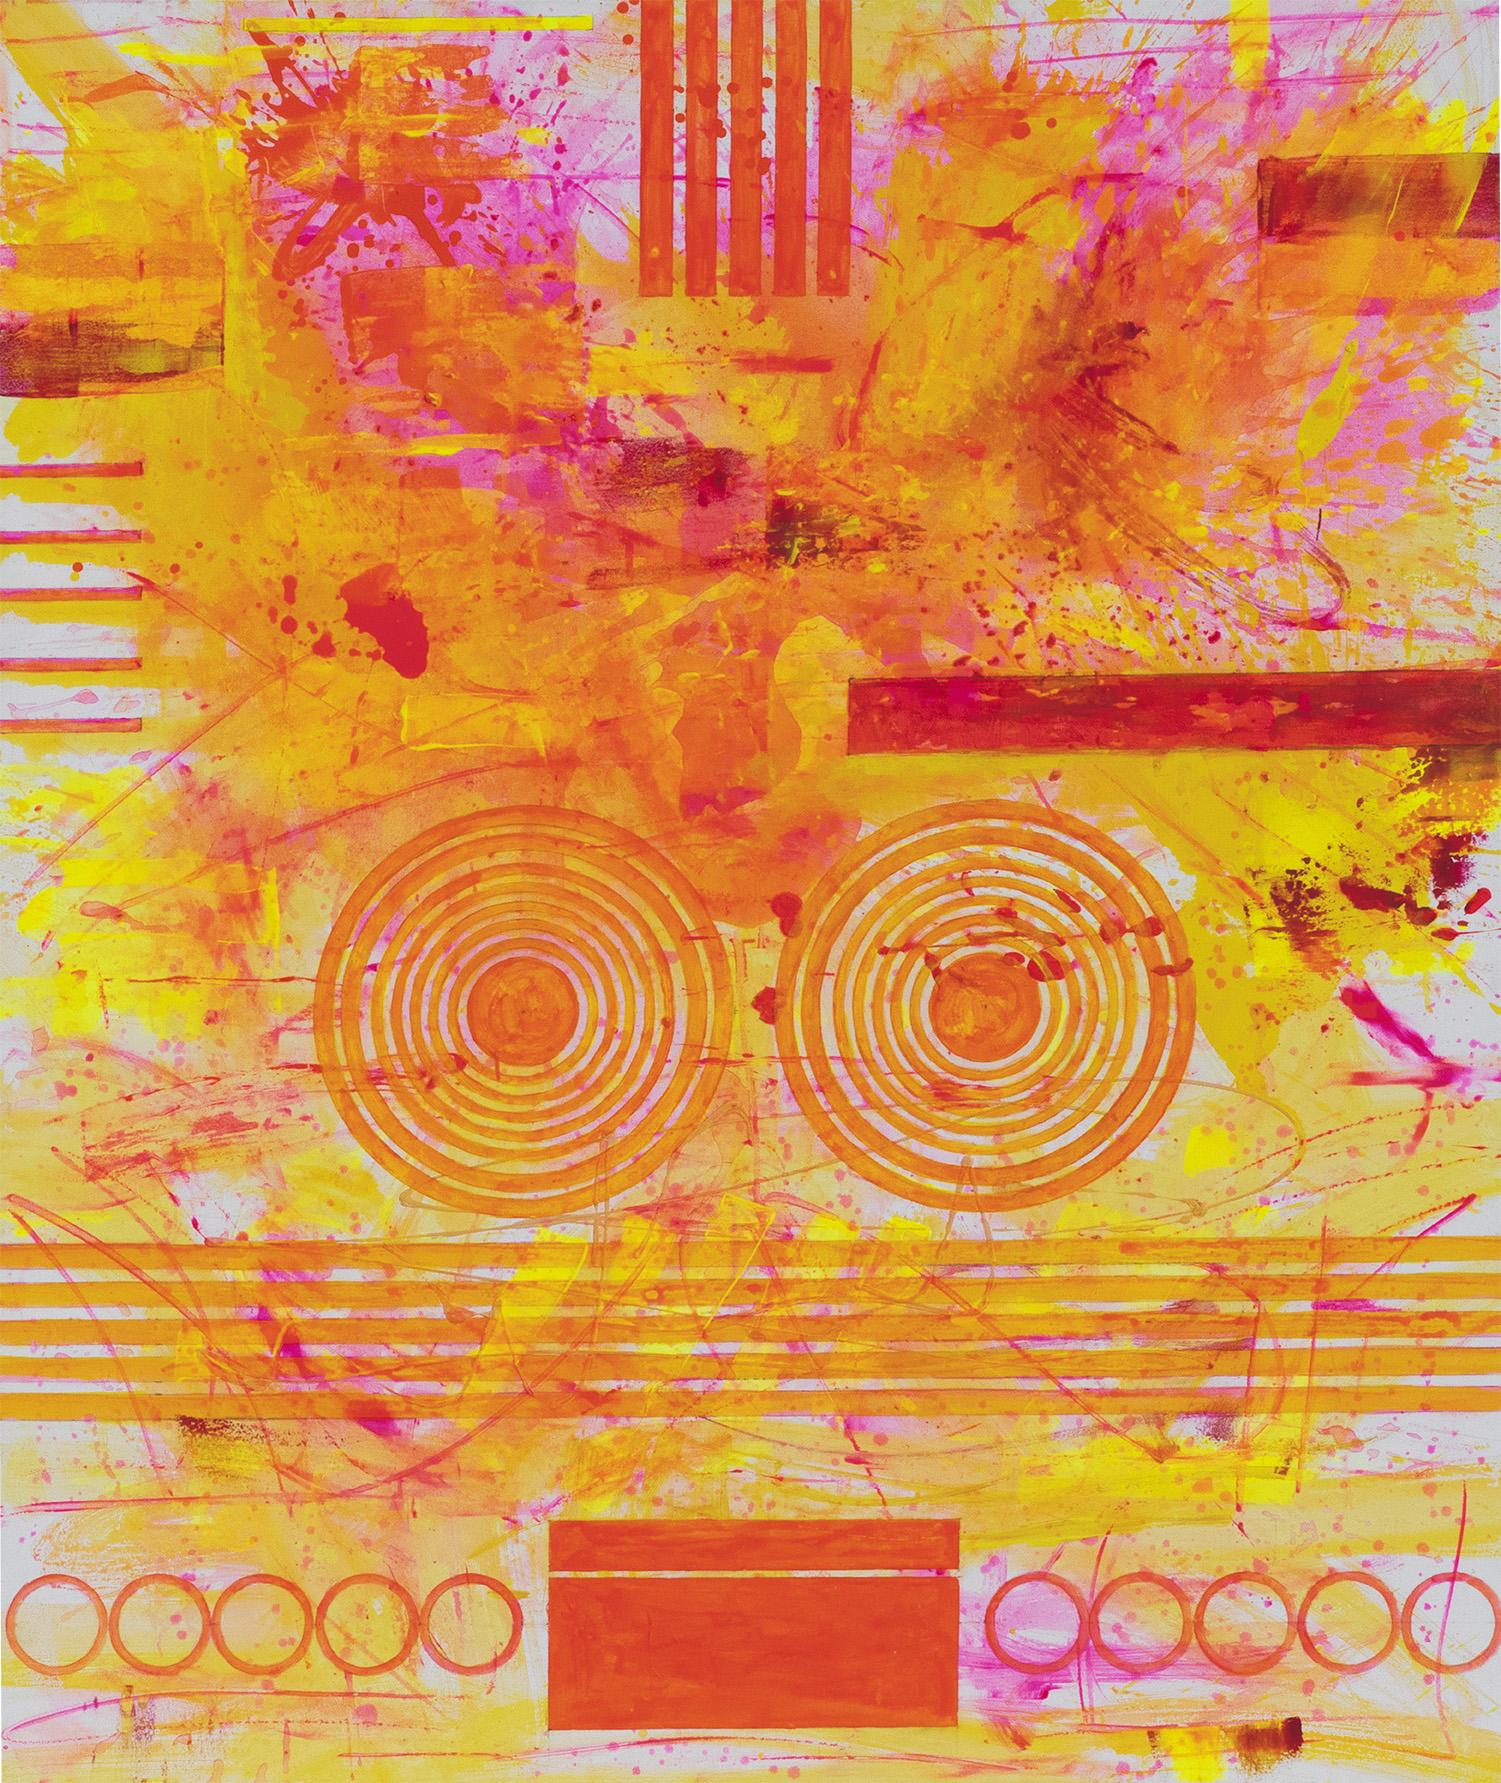 J. Steven Manolis,  Palm Beach Light - Sunrise , 2019, Acrylic on canvas 72 x 60 in.